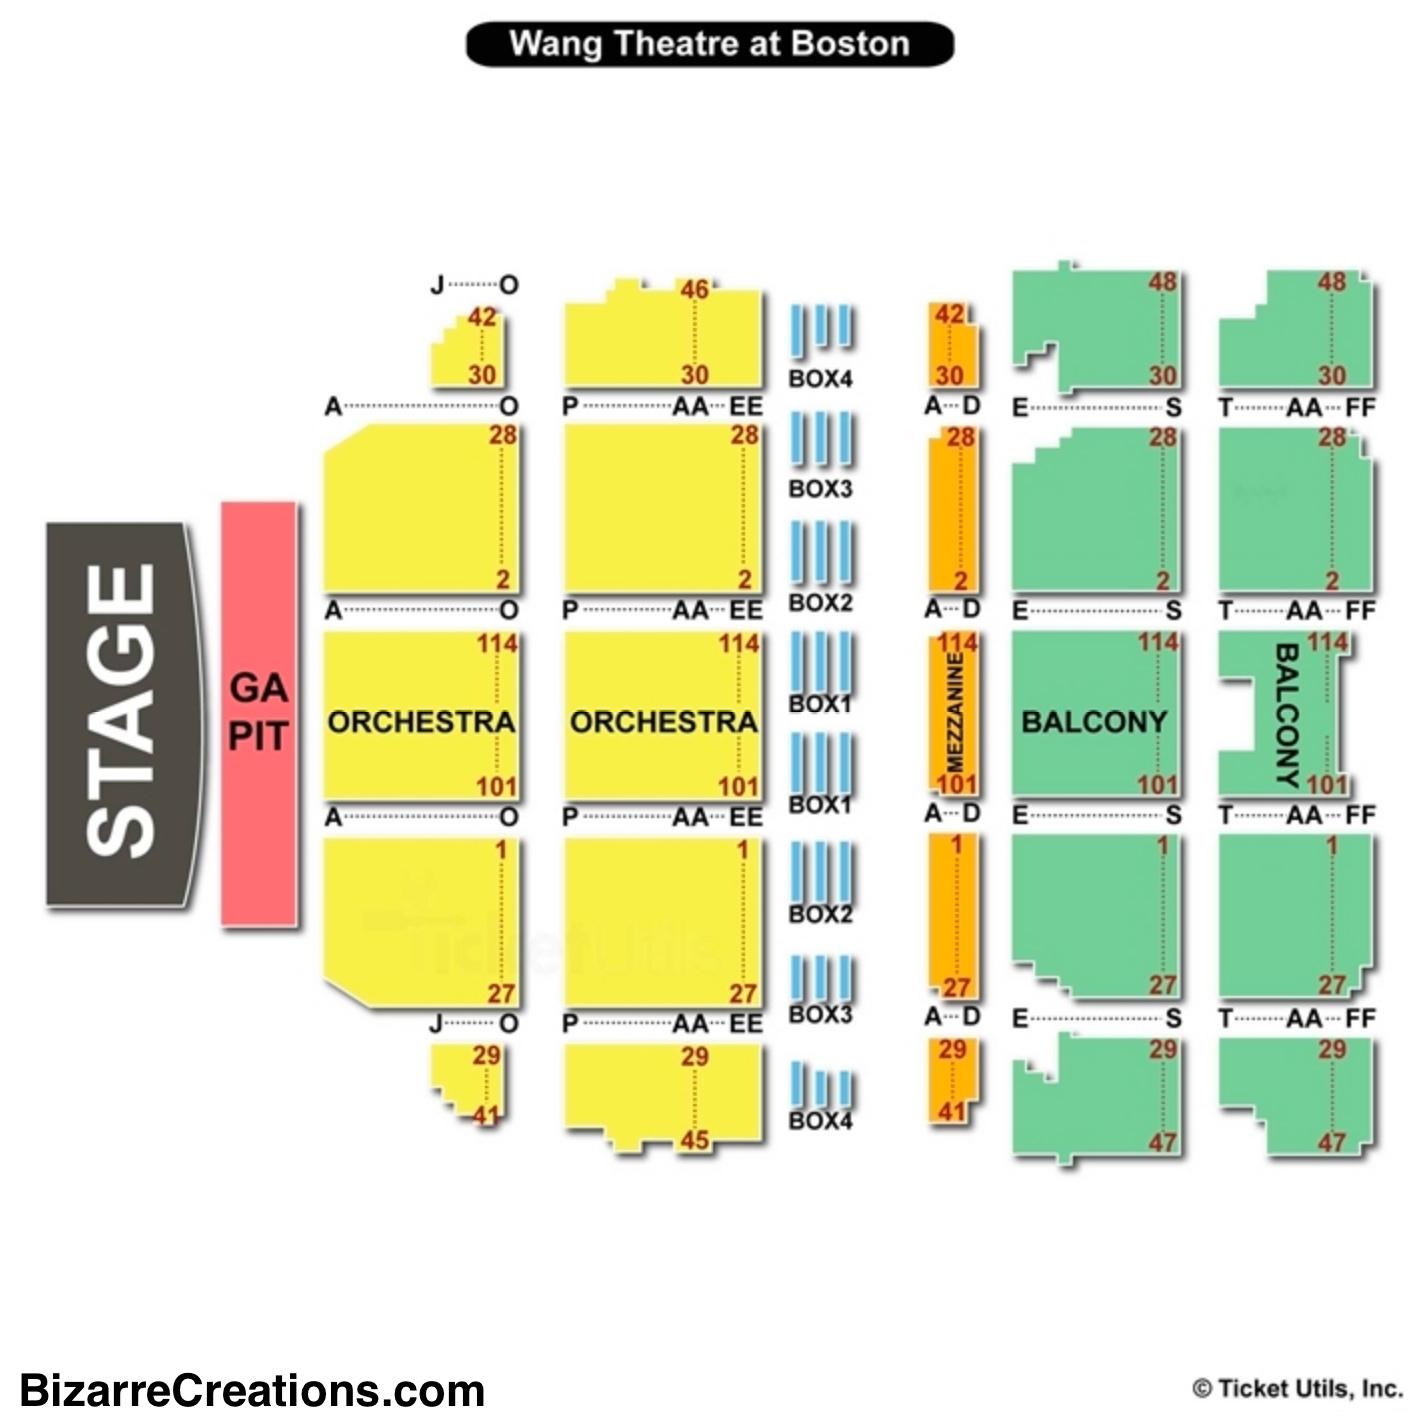 Boch Center Wang Theatre Seating Chart Boston